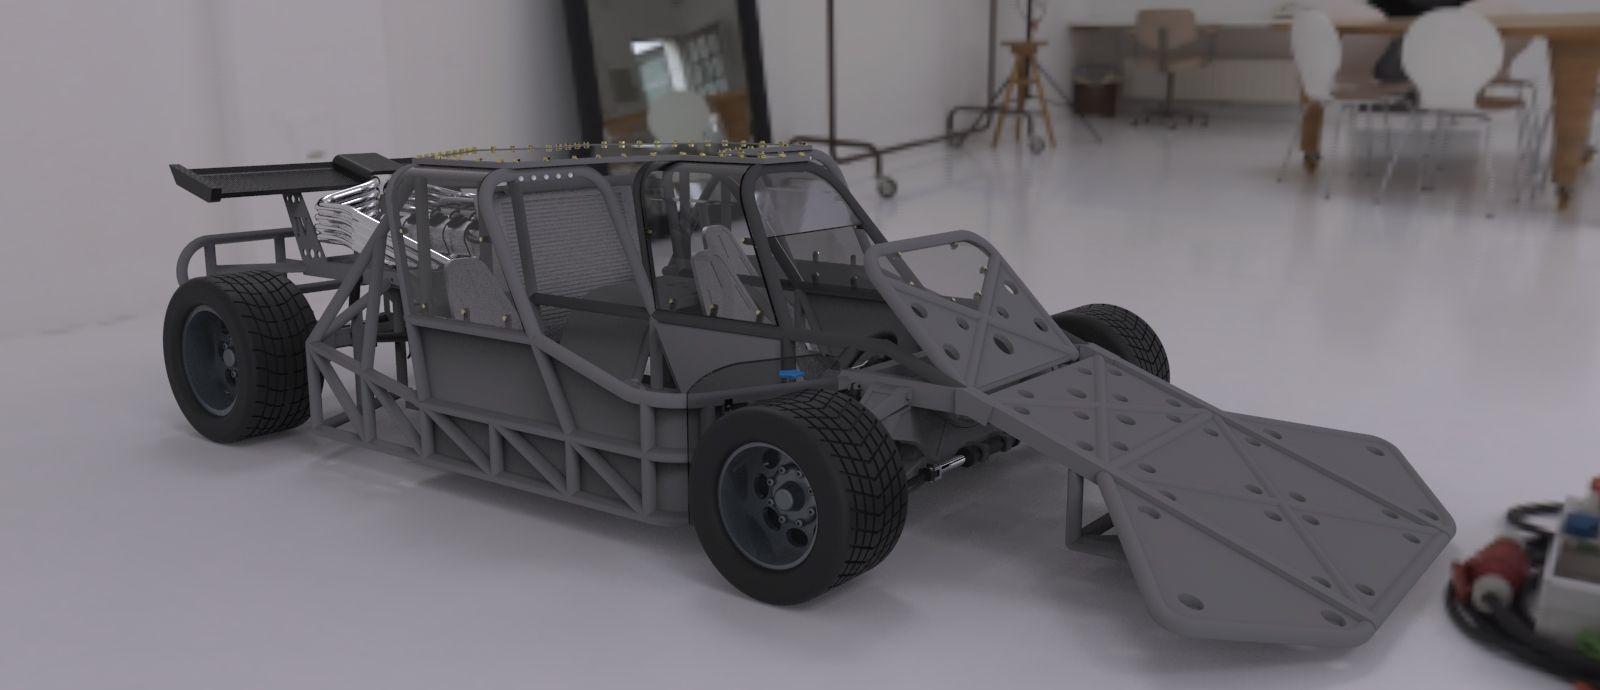 Ramp-car-31-3500-3500